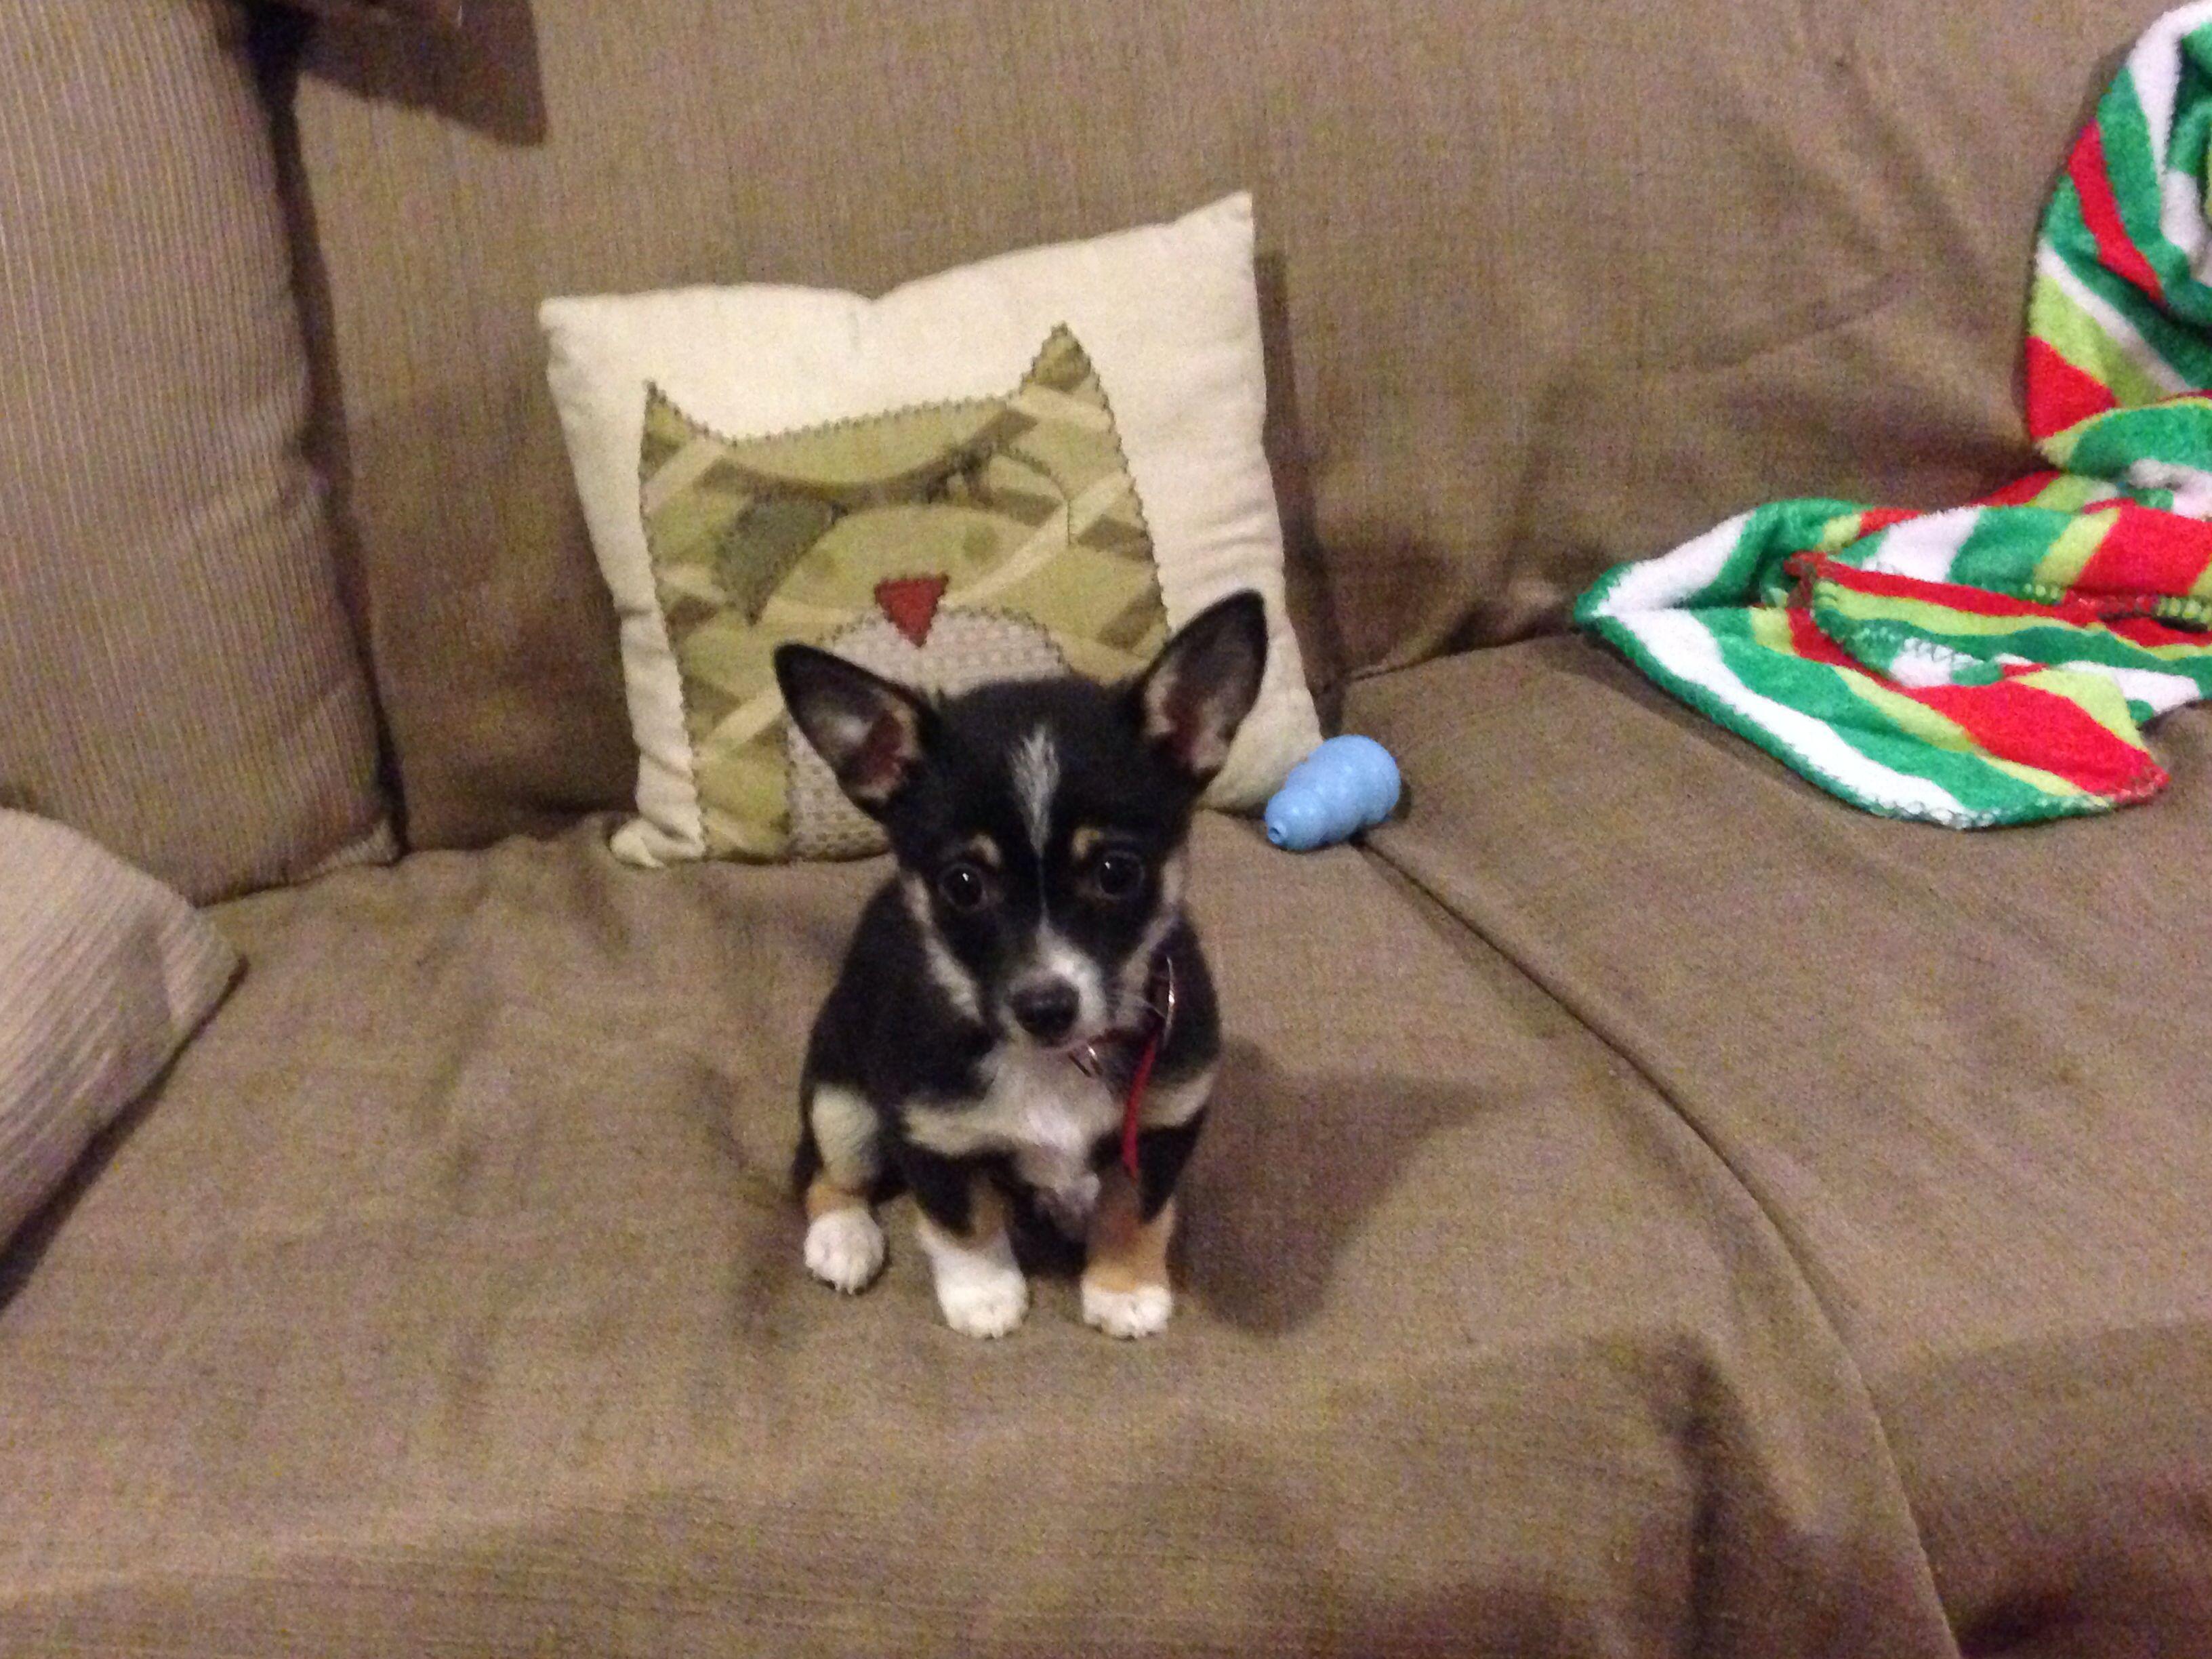 Top Chihuahua Chubby Adorable Dog - 69e3d258a1215ed9ba89b3b4c7152b61  HD_589012  .jpg